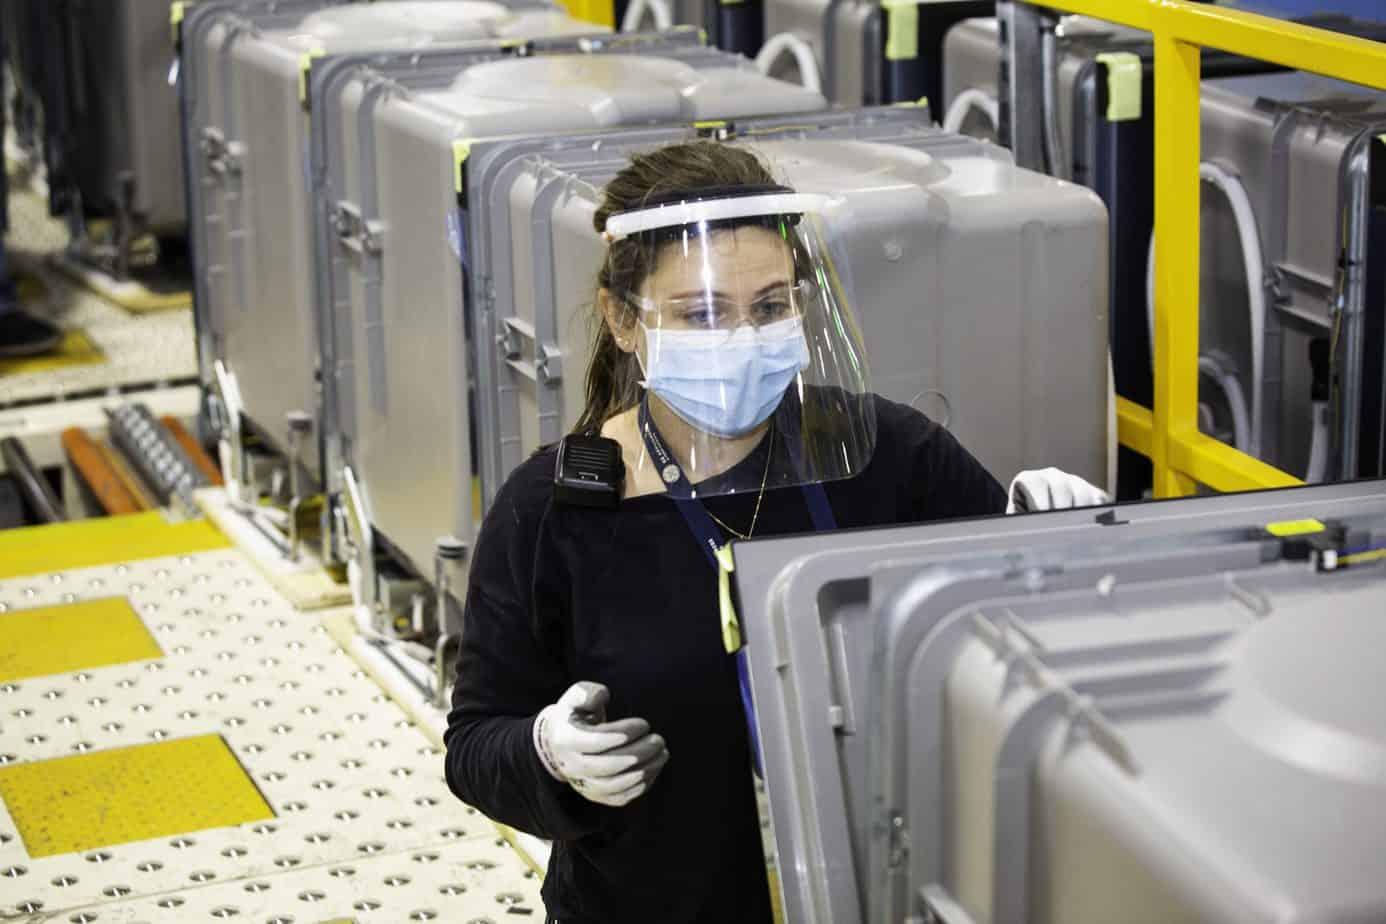 New GE Dishwasher Line